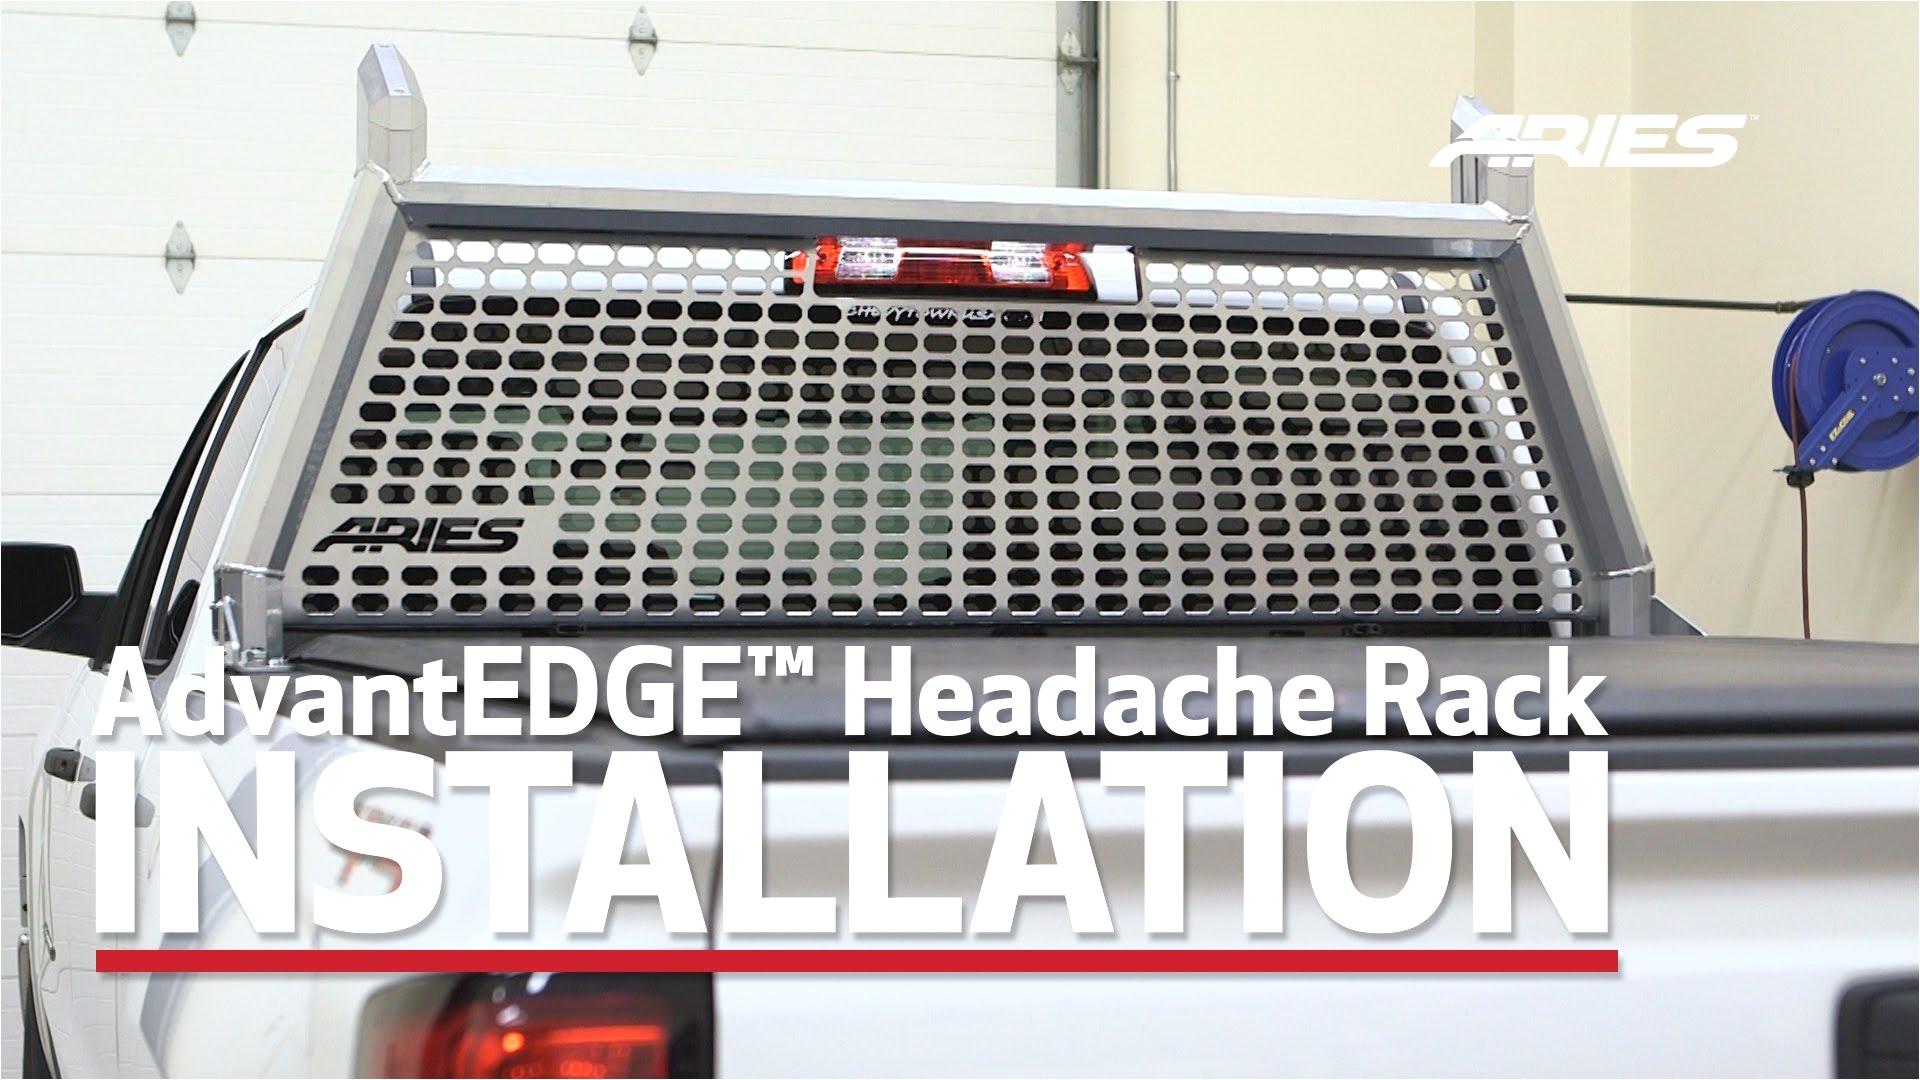 Back Rack with tonneau Cover Aries Advantedgea Install Headache Rack 1110204 On Chevy Silverado